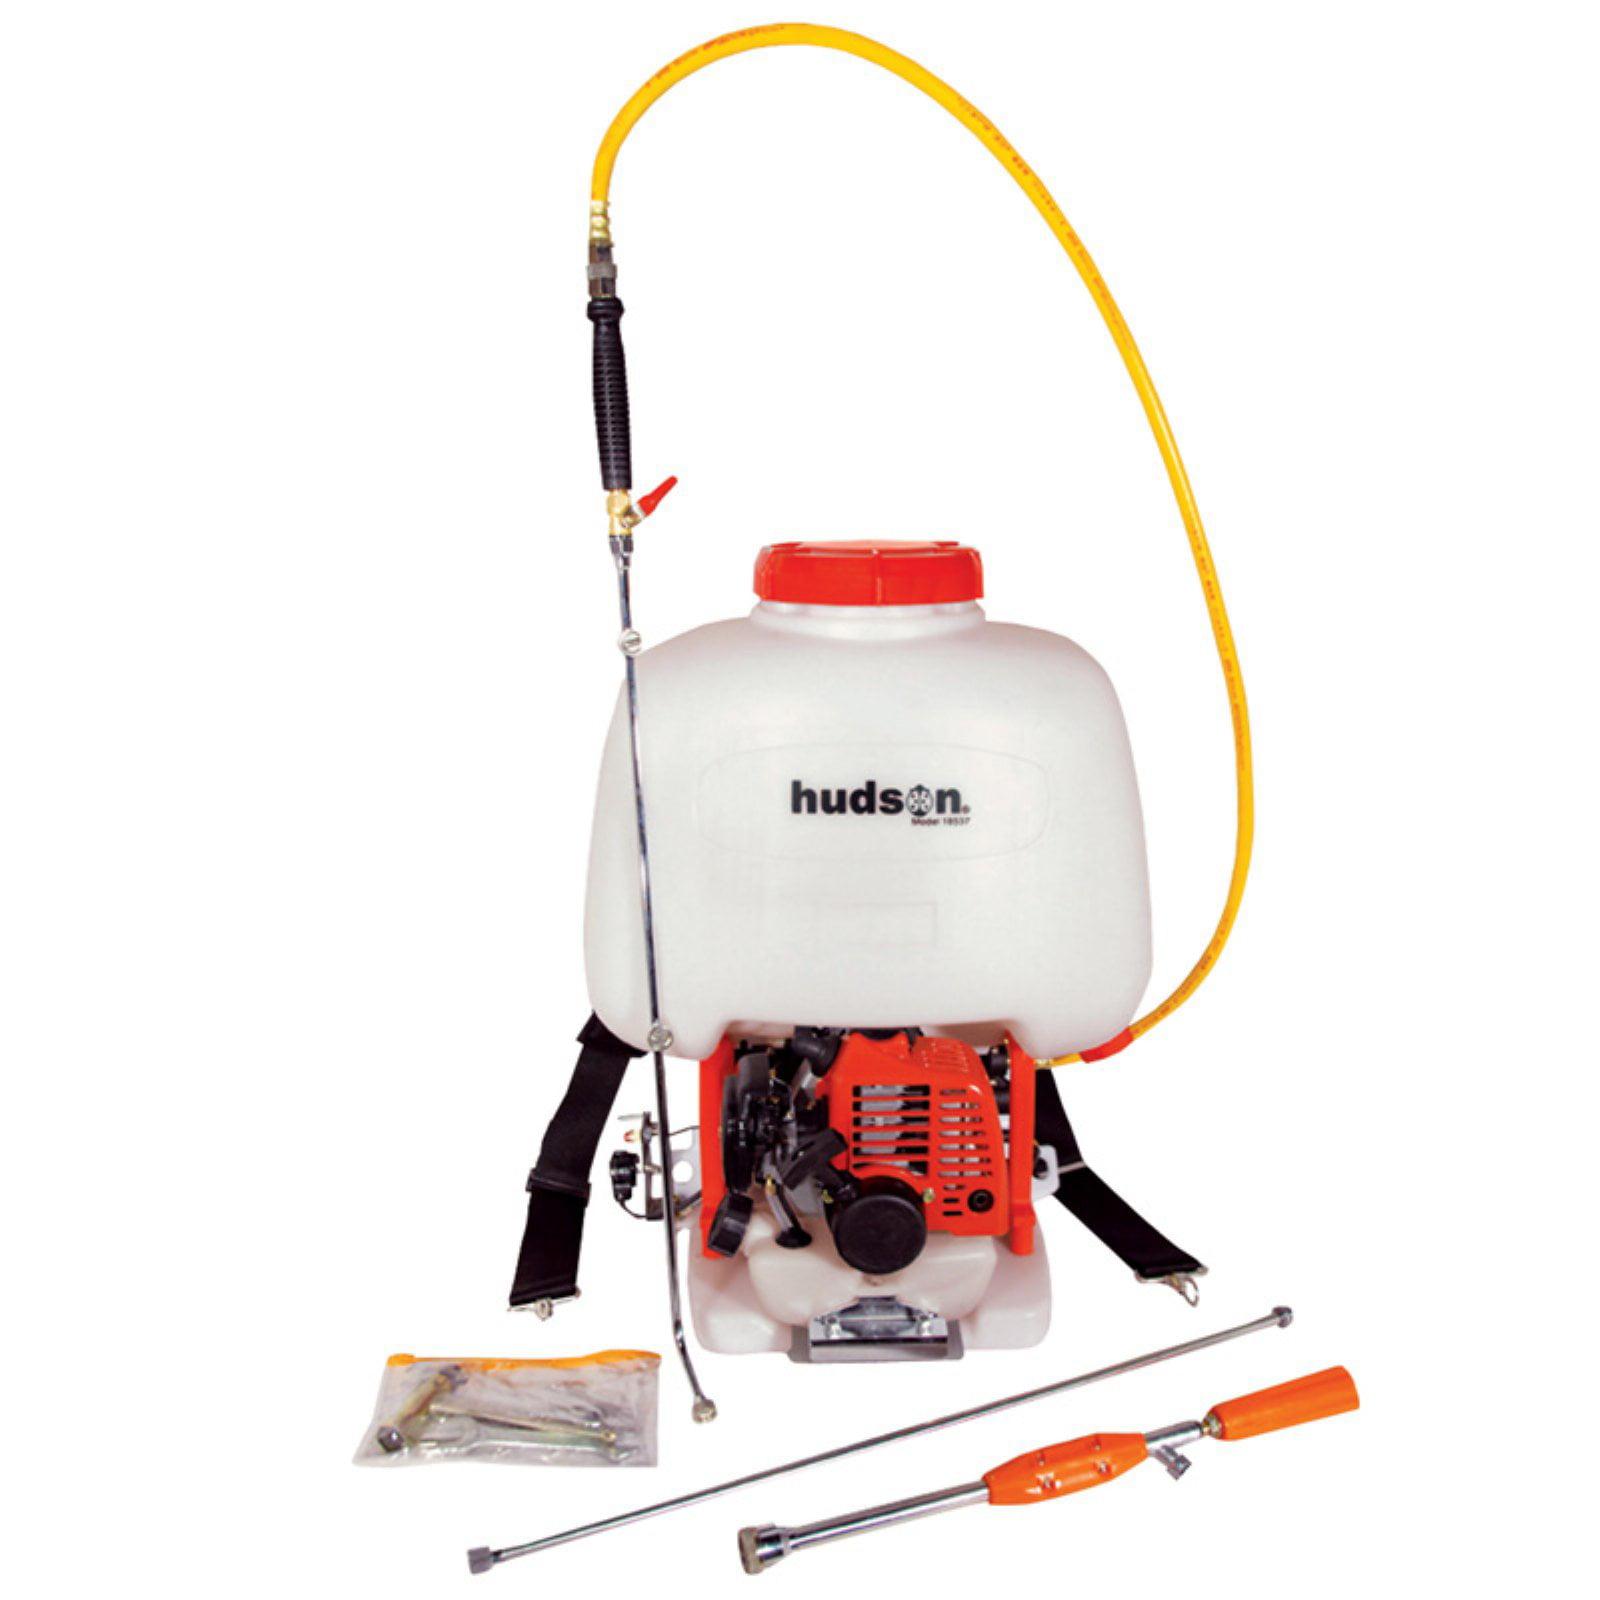 H.D. Hudson Bak-Pak Power Sprayer